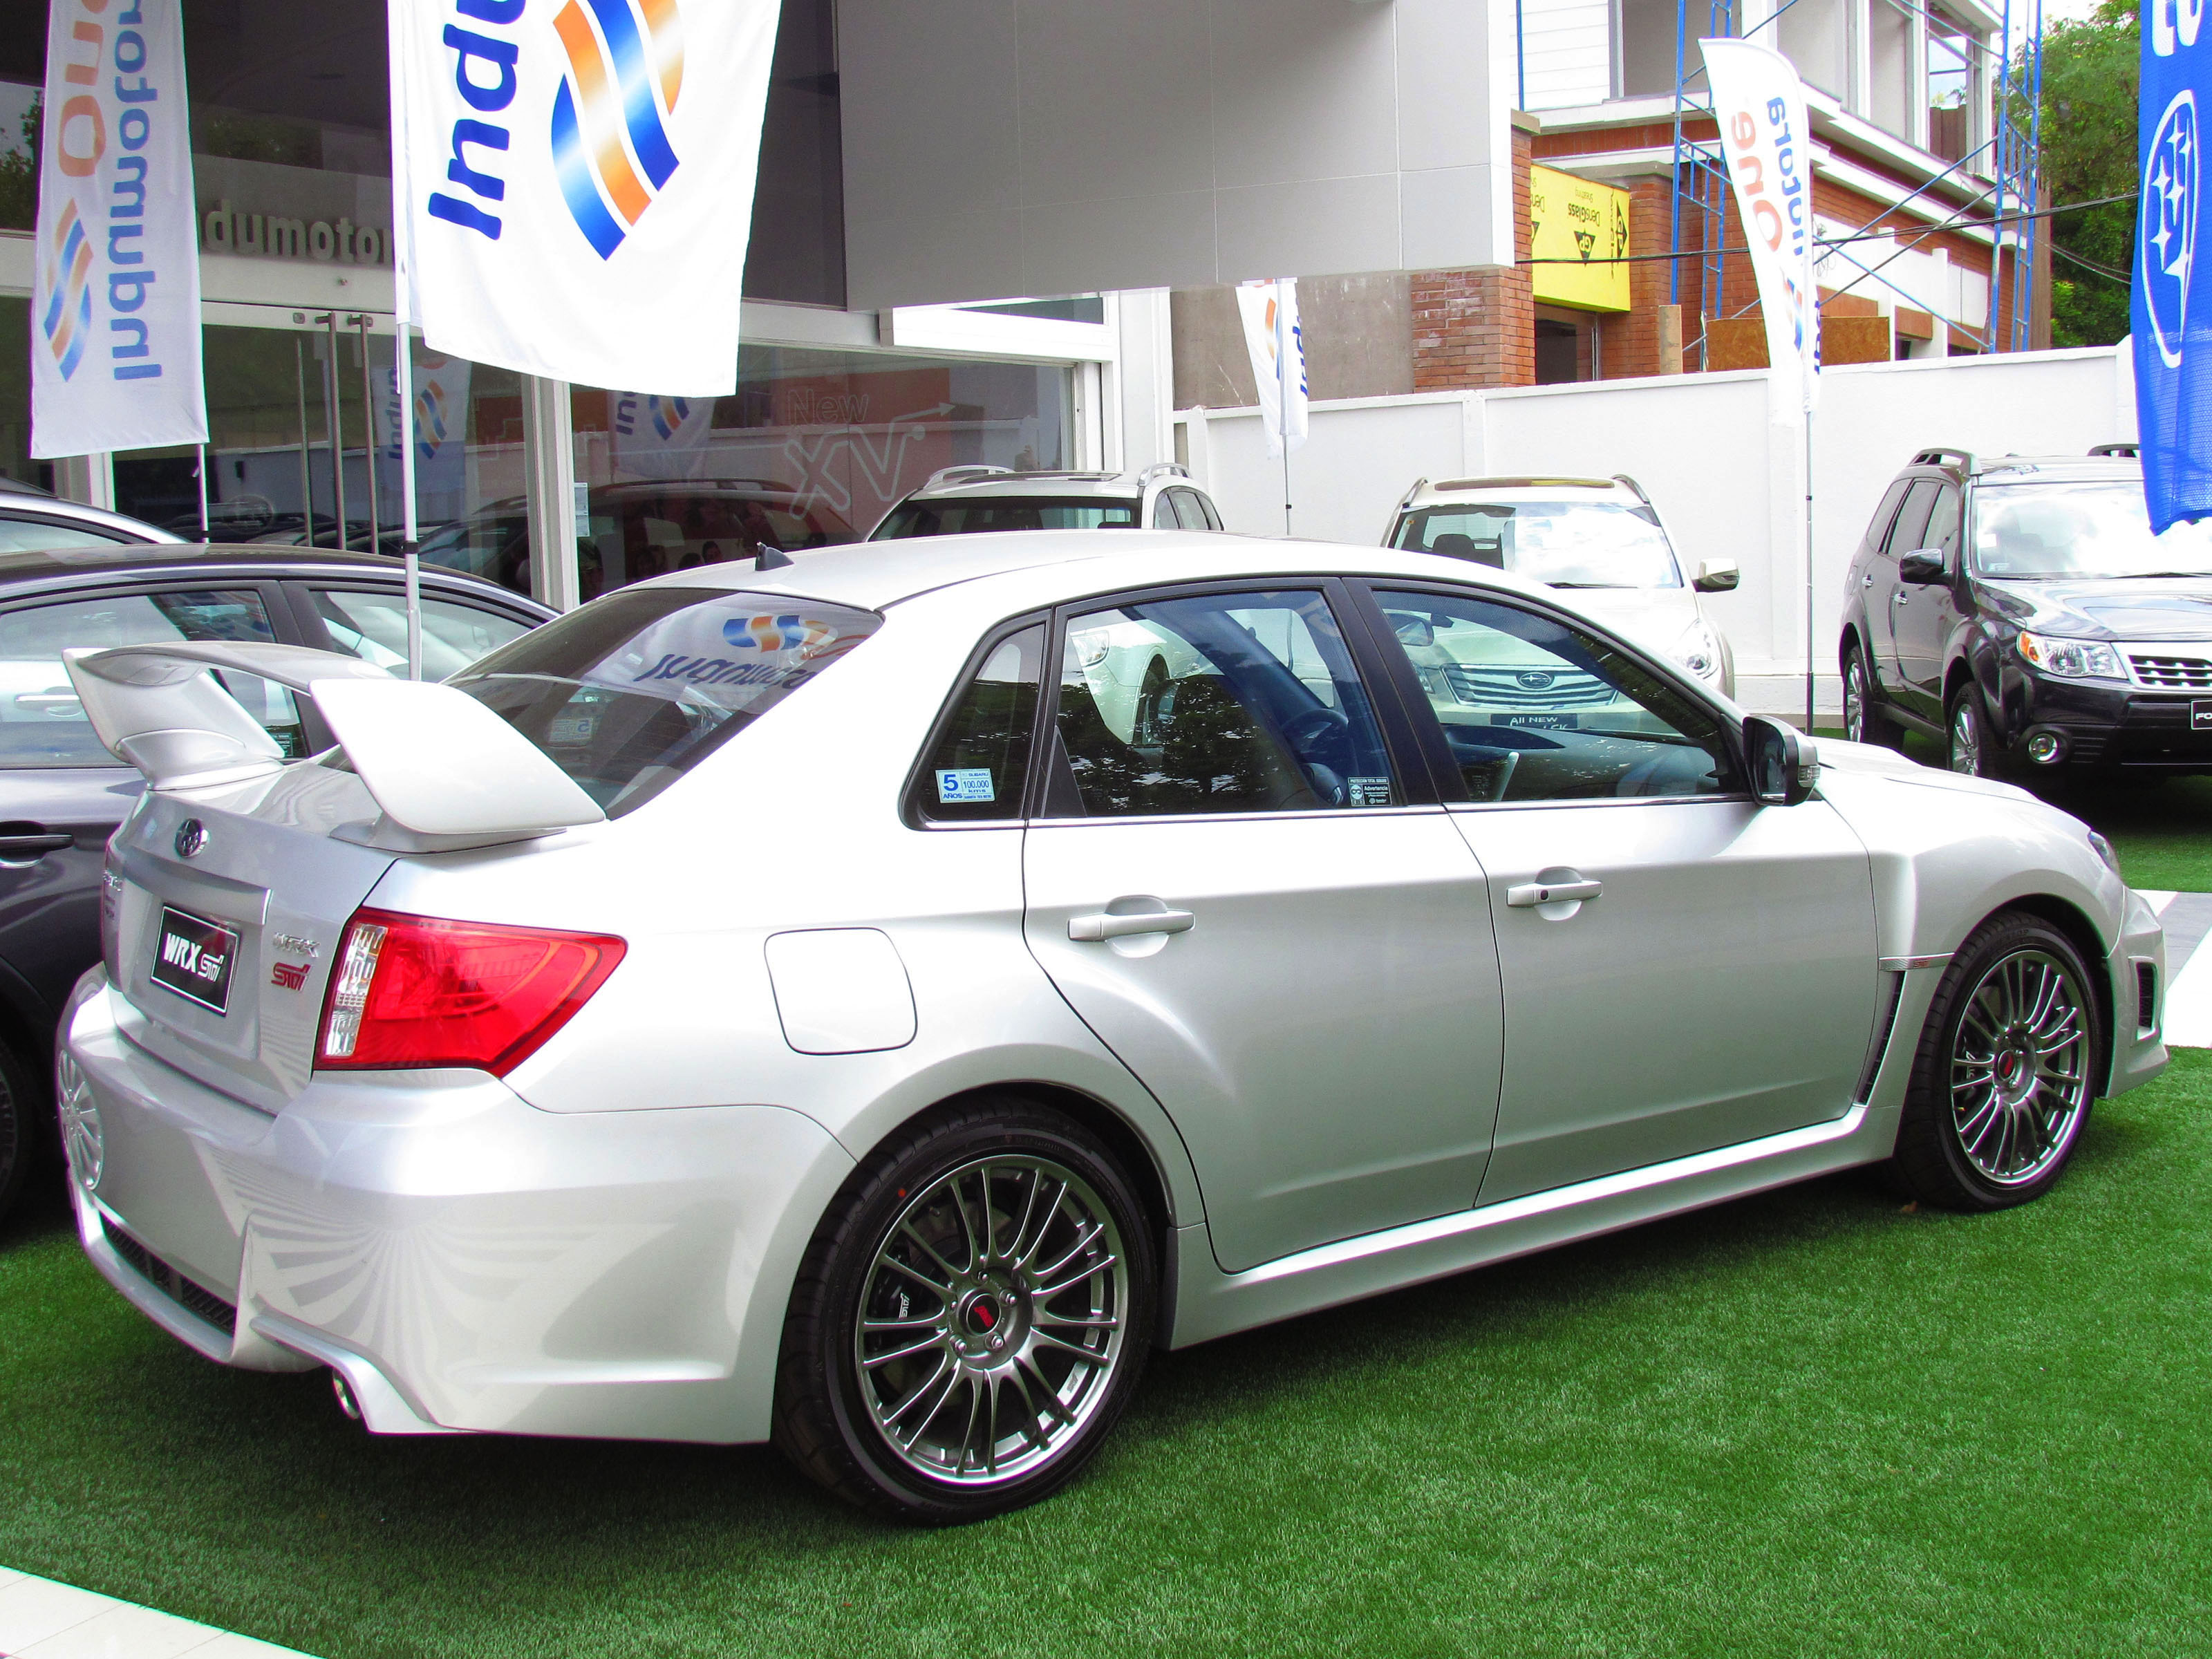 File Subaru Impreza Wrx Sti Sedan 2011 15616342681 Jpg Wikimedia